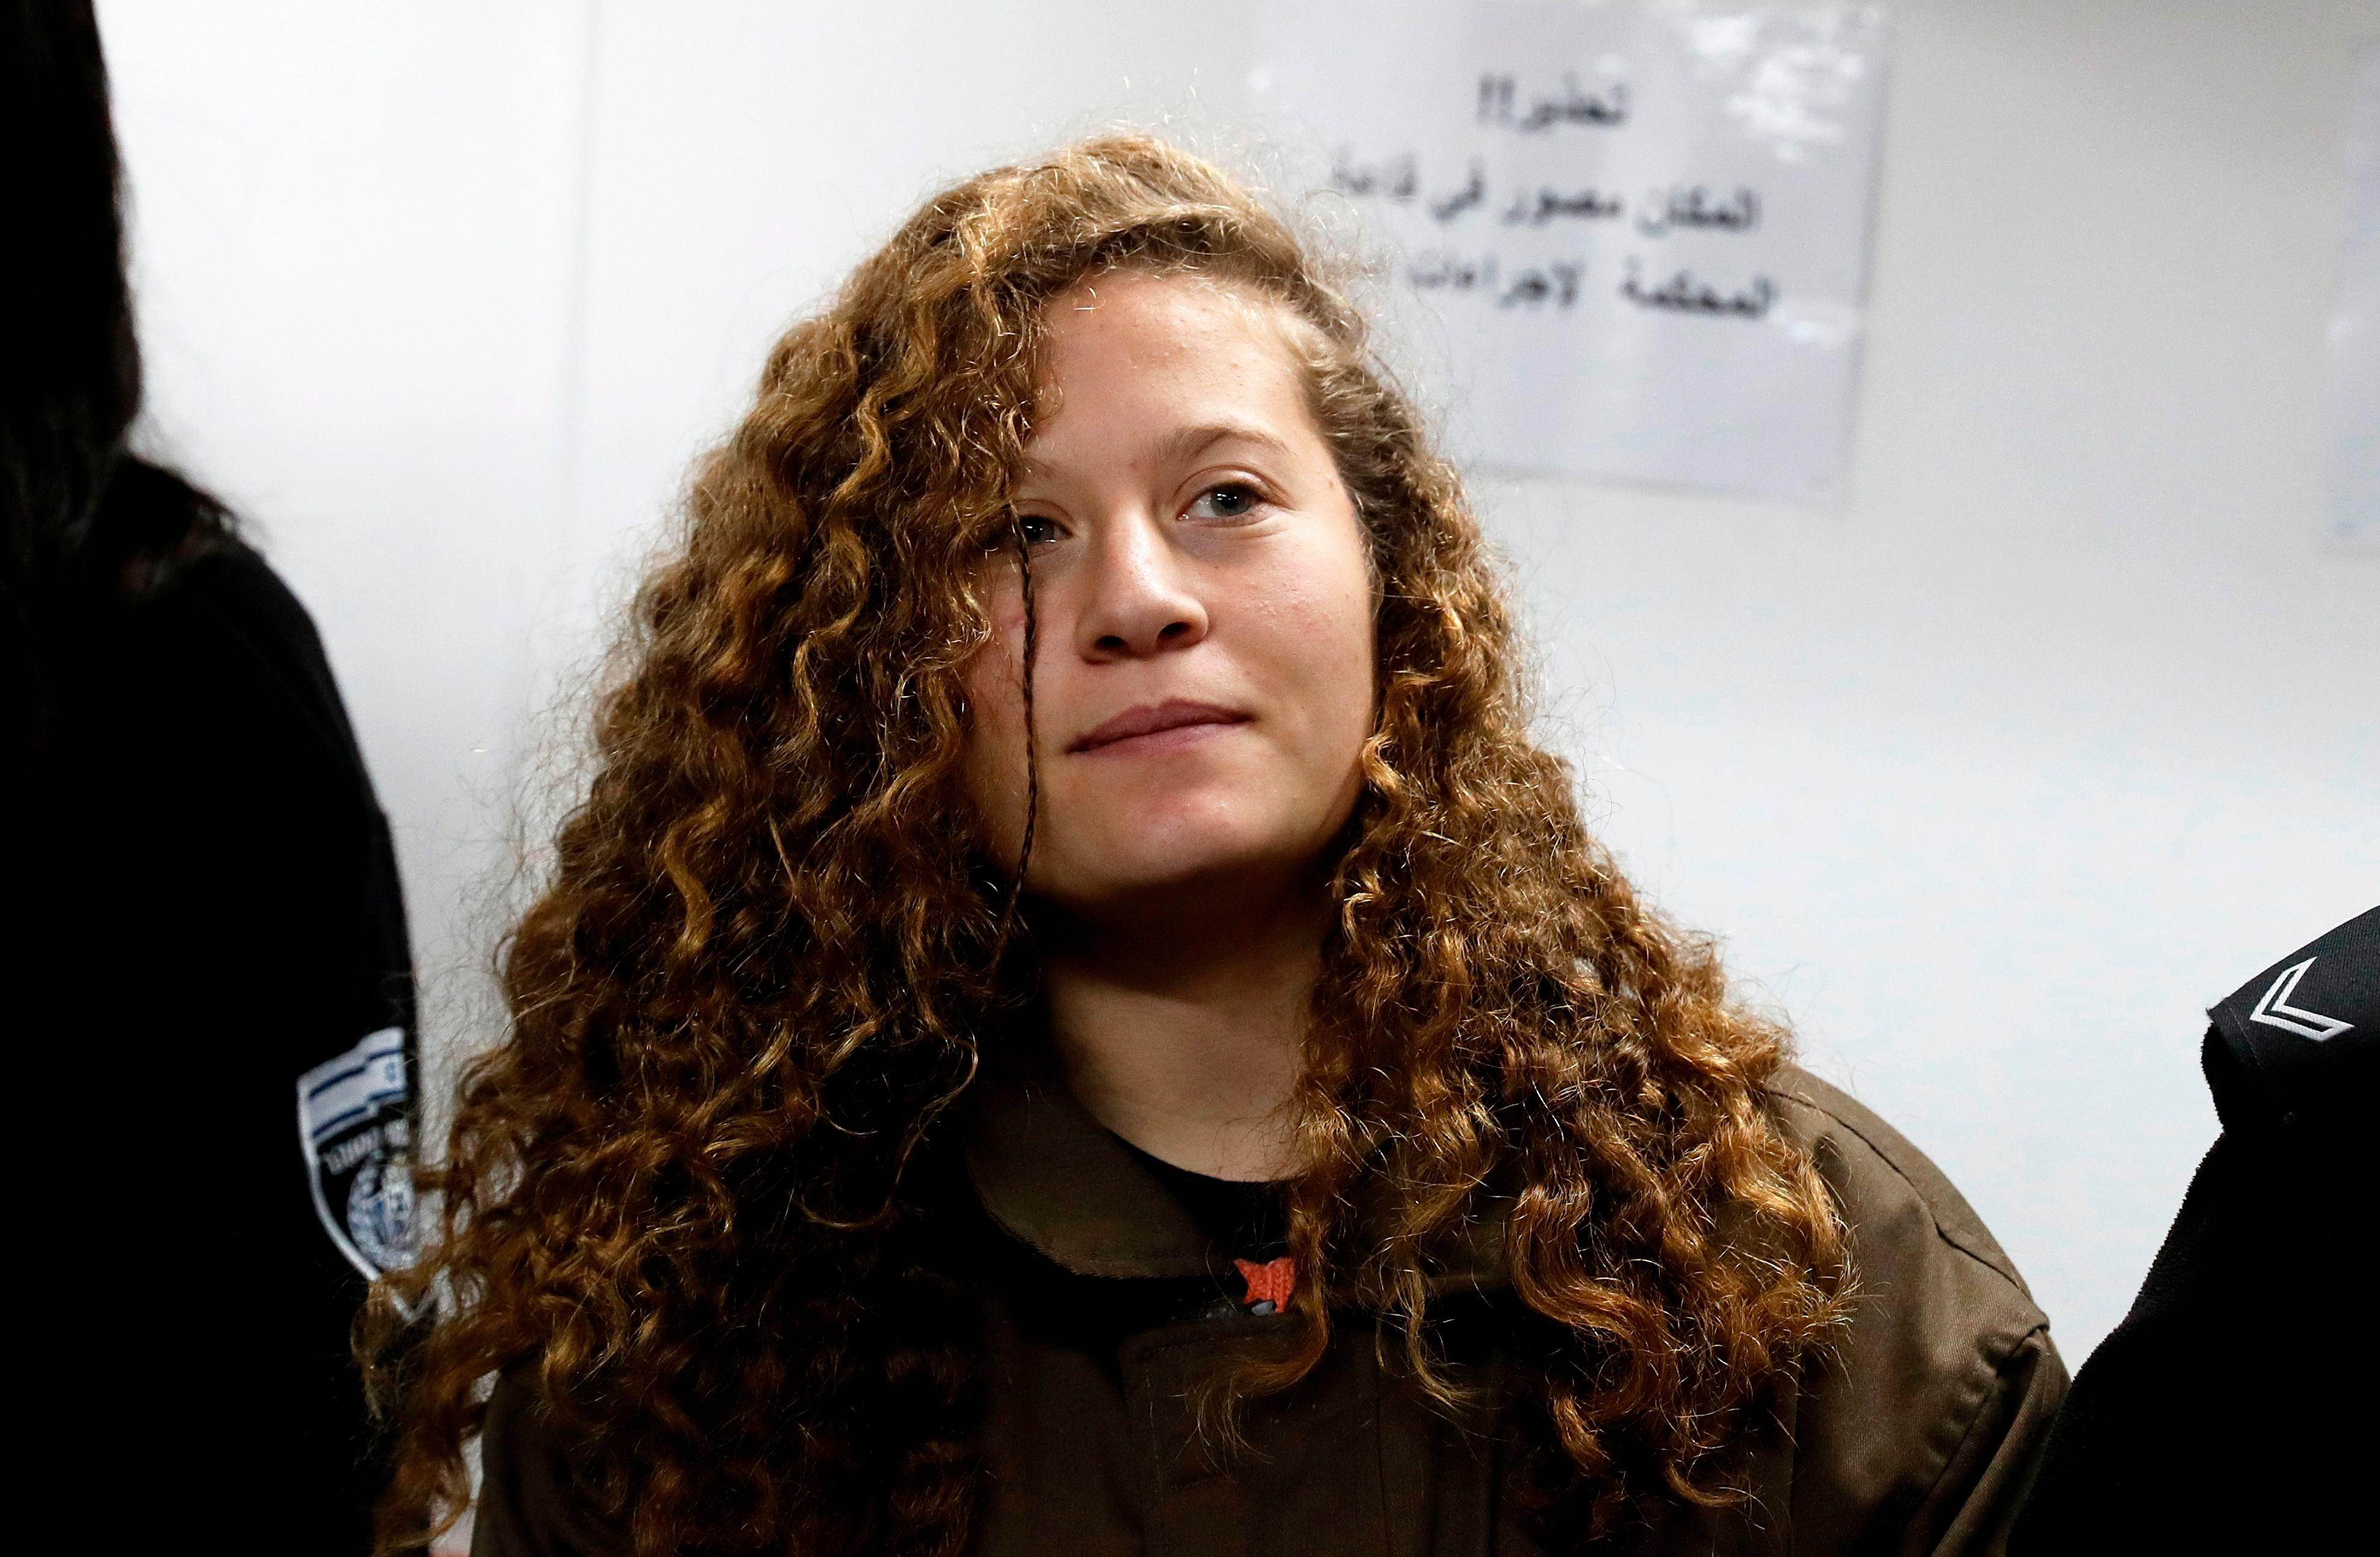 Real Madrid Honors Activist Palestinian Teen Ahed Tamimi